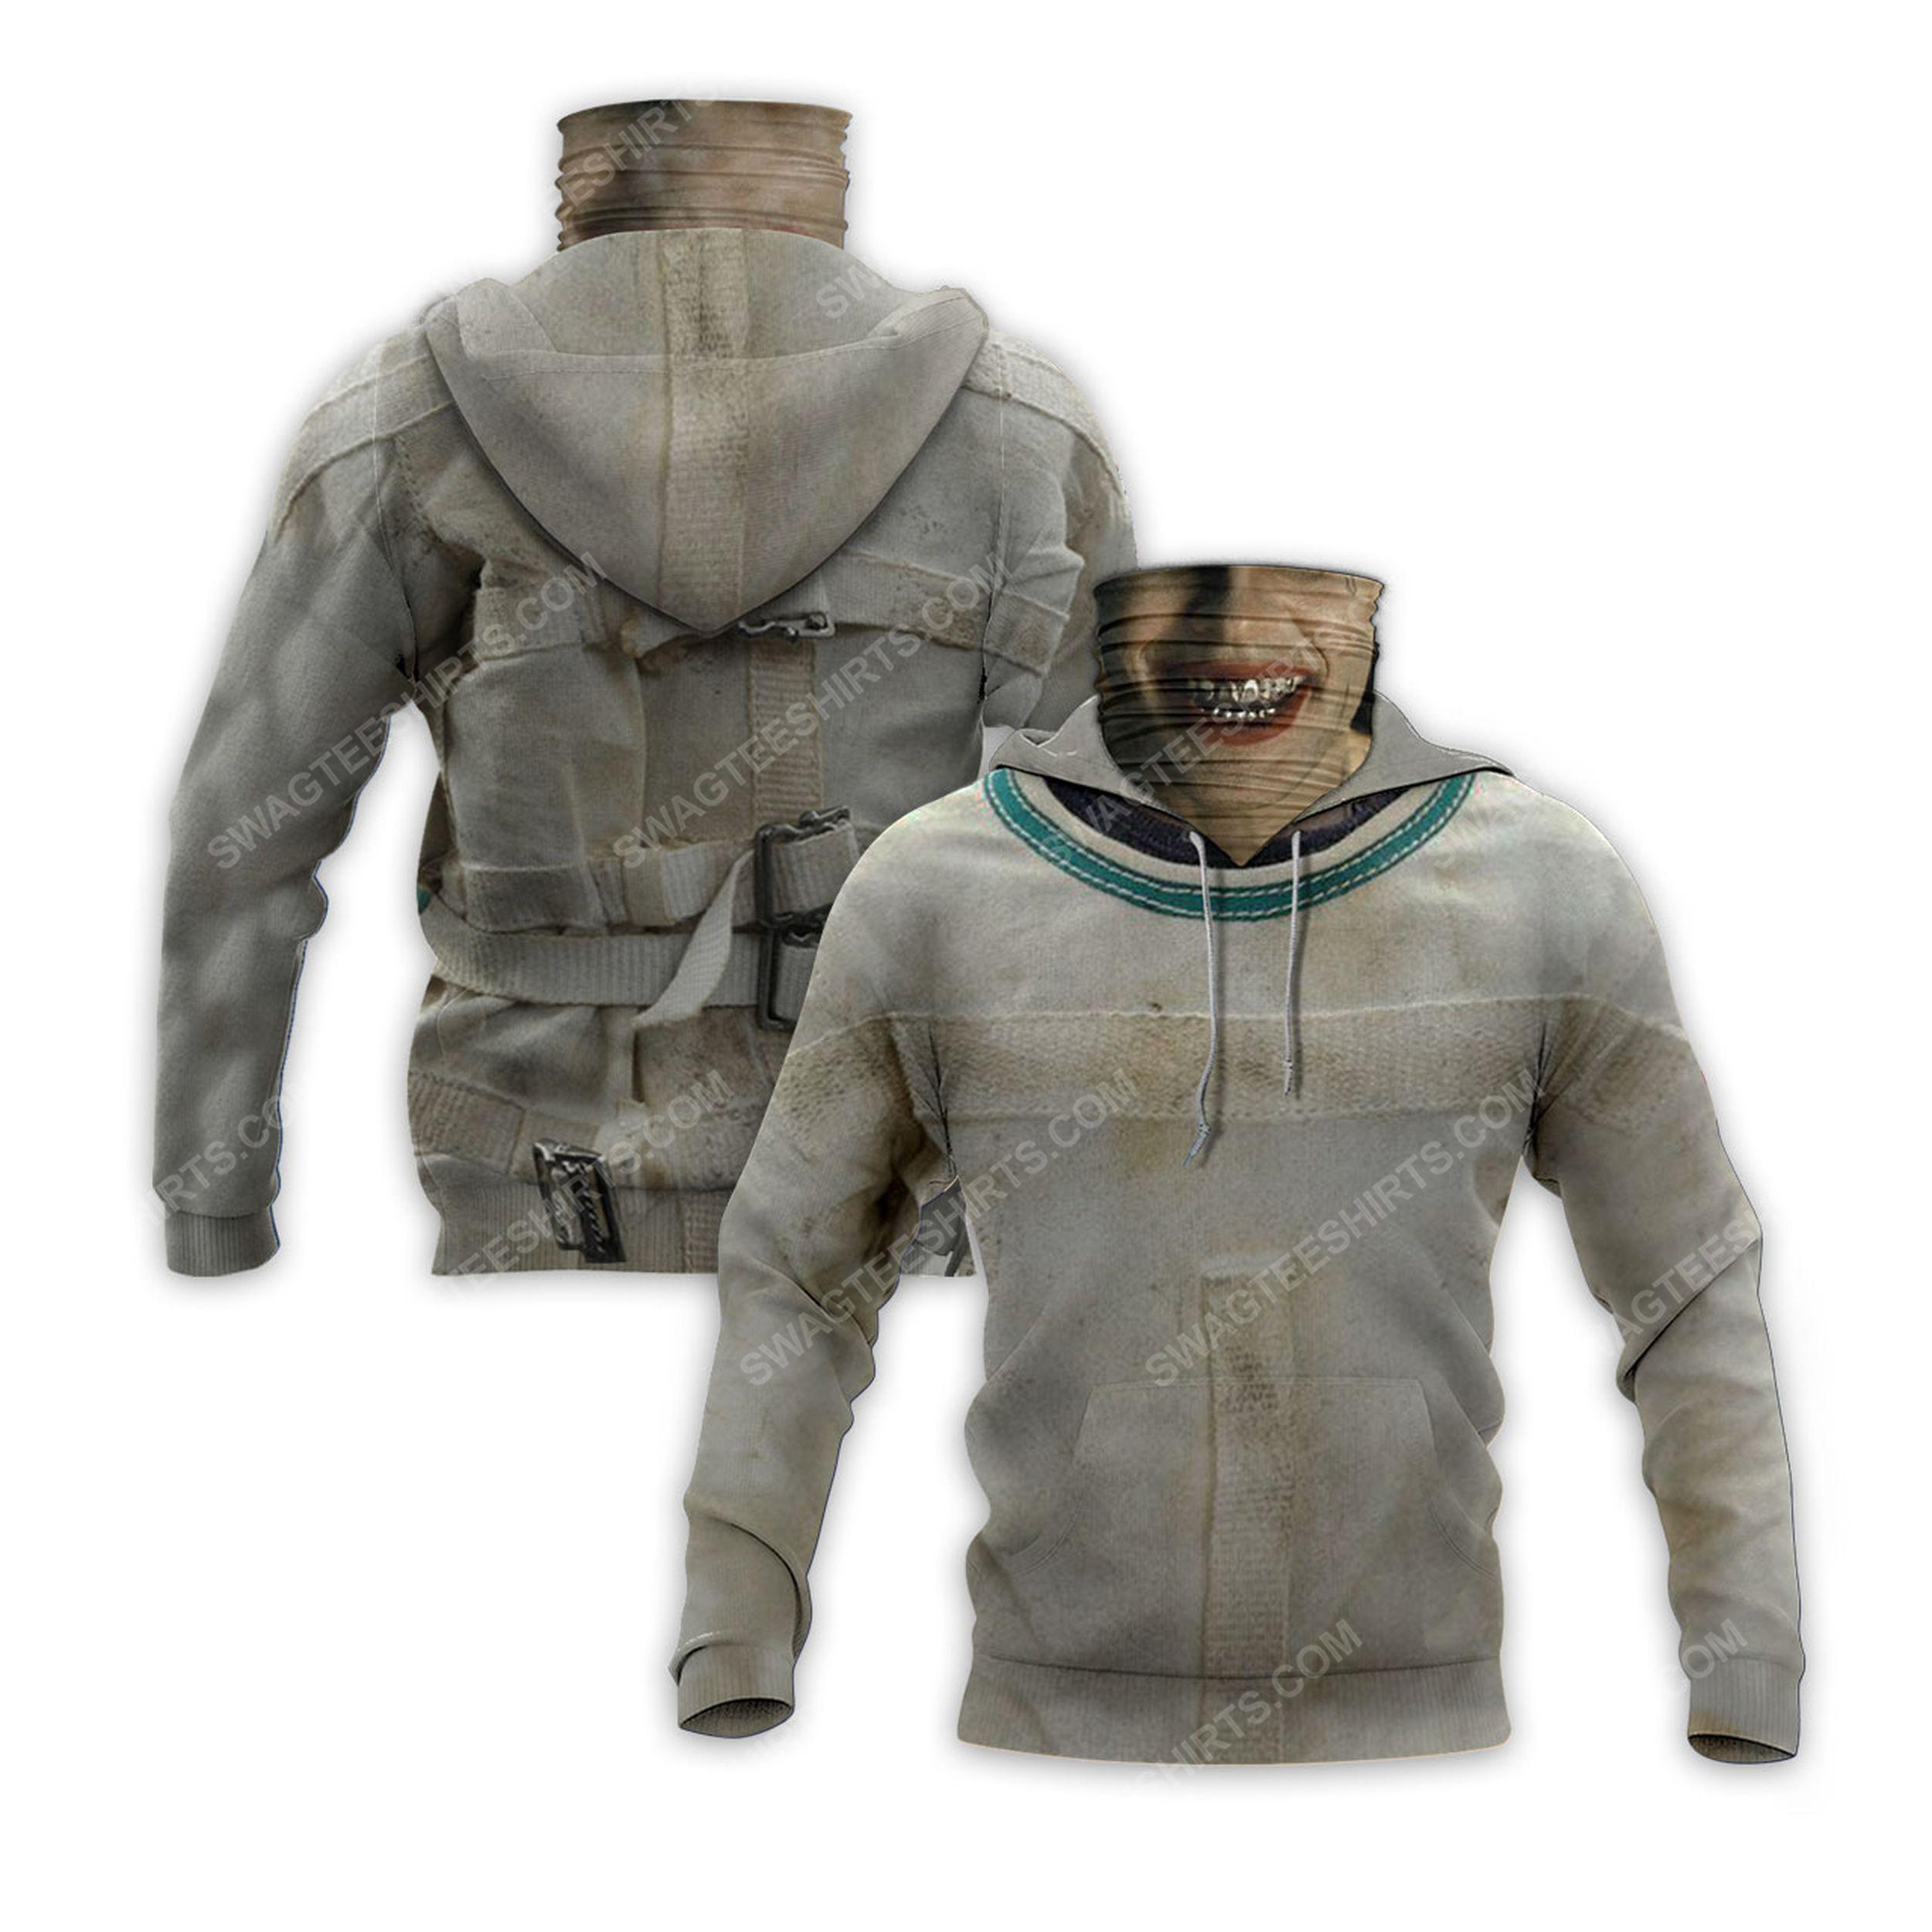 Joker suicide squad full print mask hoodie 2(1) - Copy